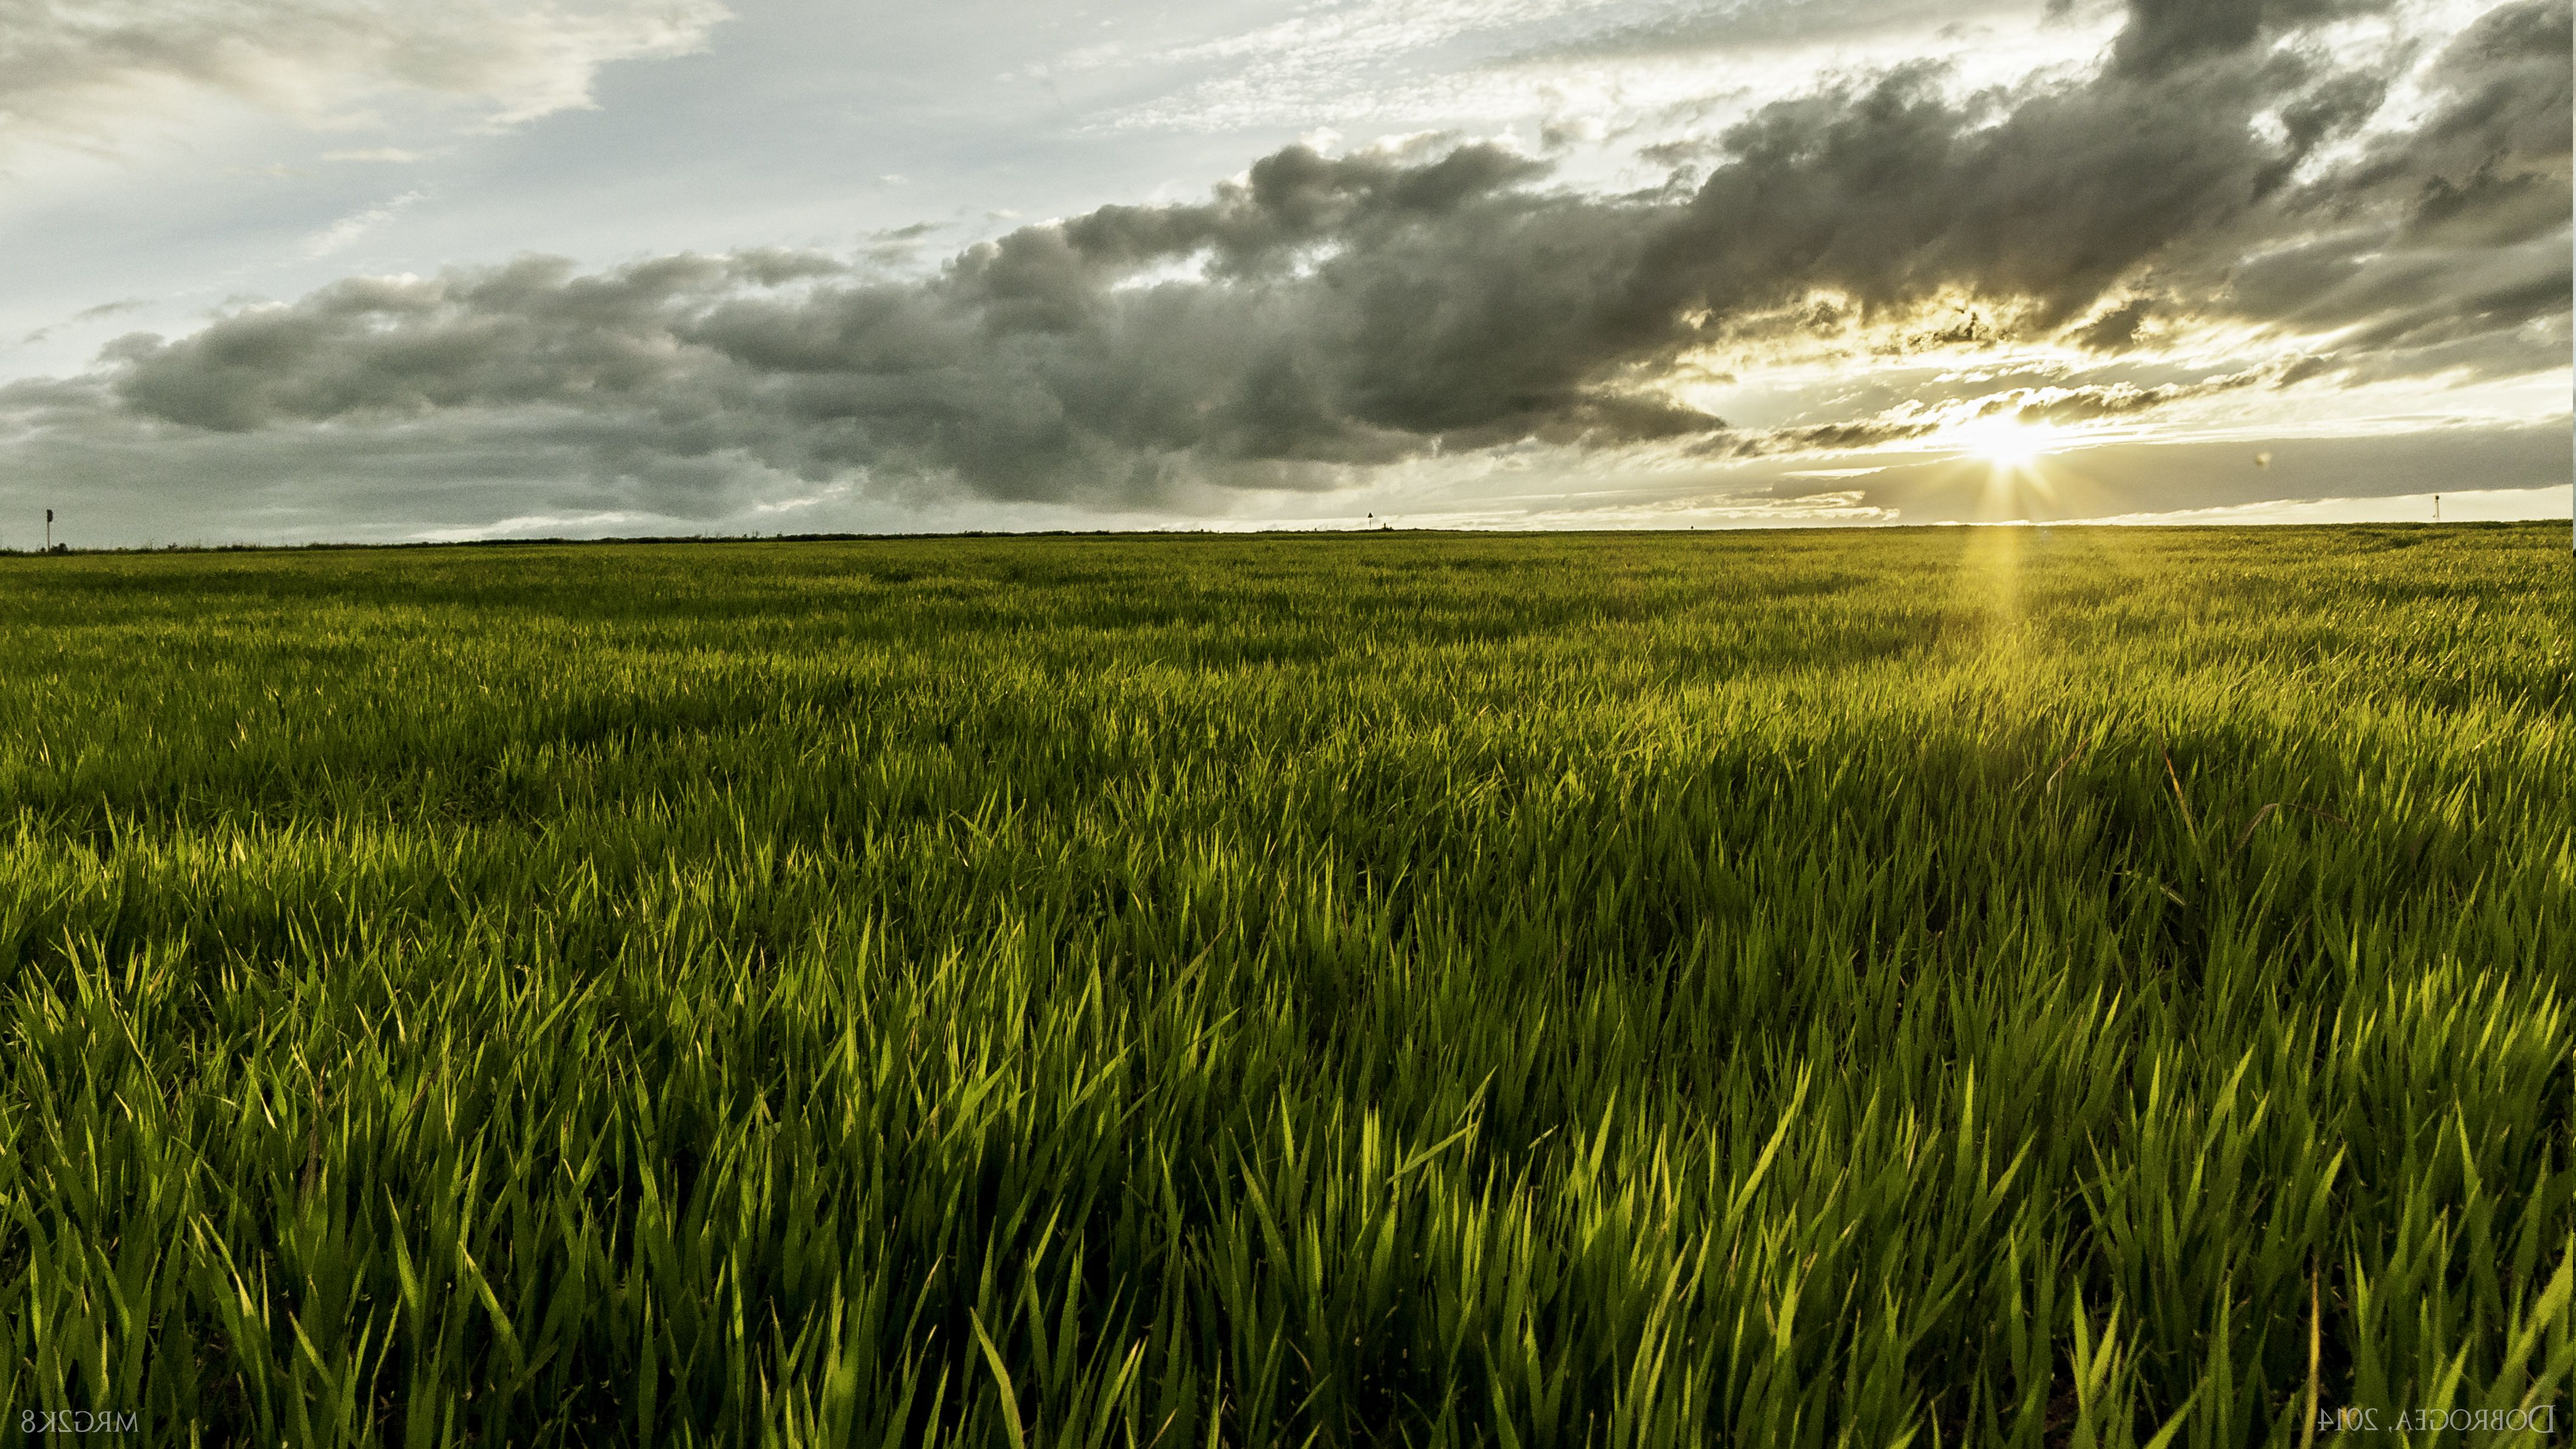 Grass Sunlight Romania Landscape Nature Field Wallpapers Hd Field Wallpaper Desktop Wallpaper Macbook Landscape